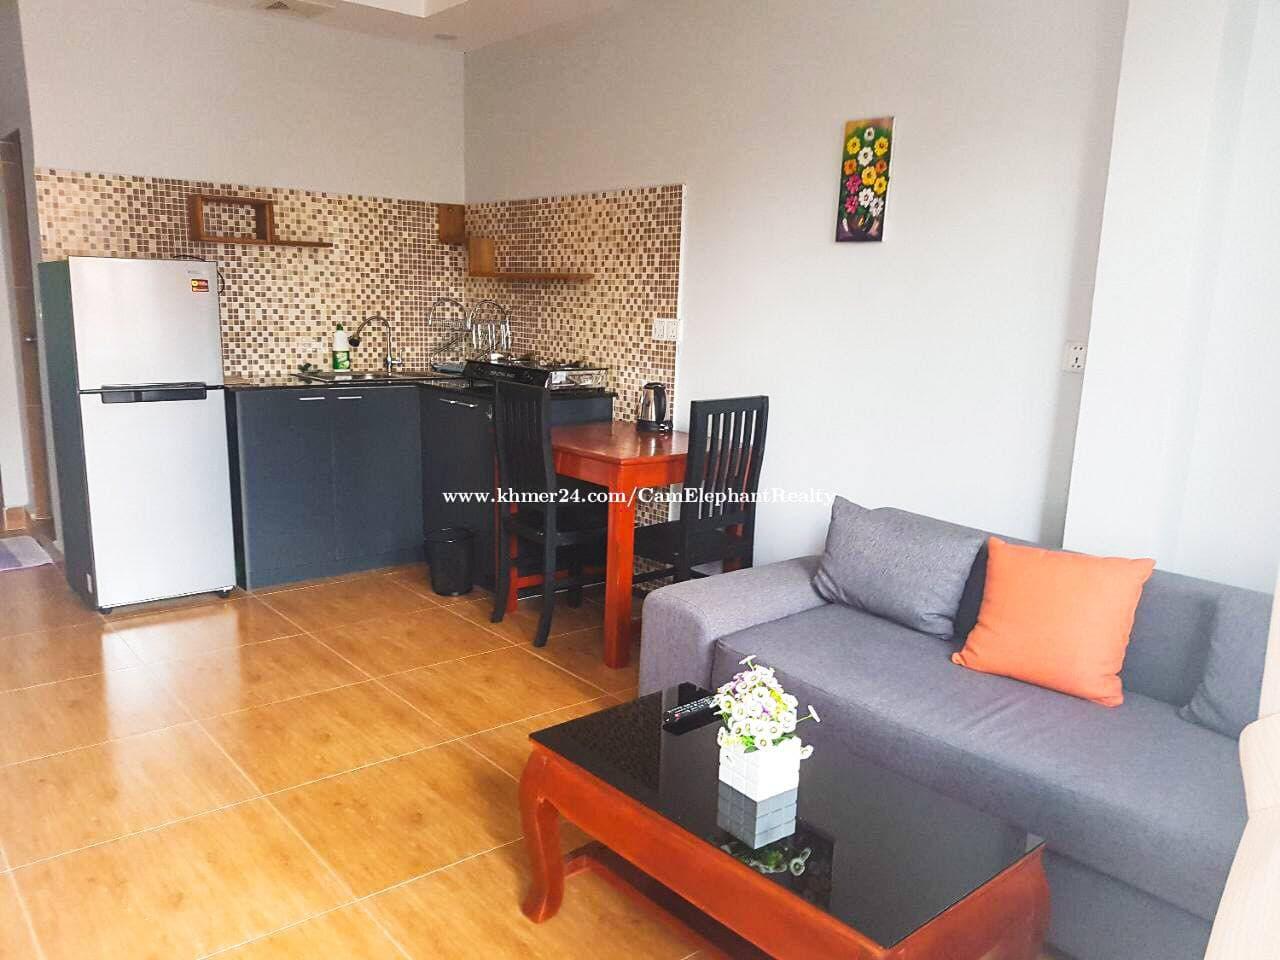 Apartment for Rent (1 Bedroom; Daun Penh area)